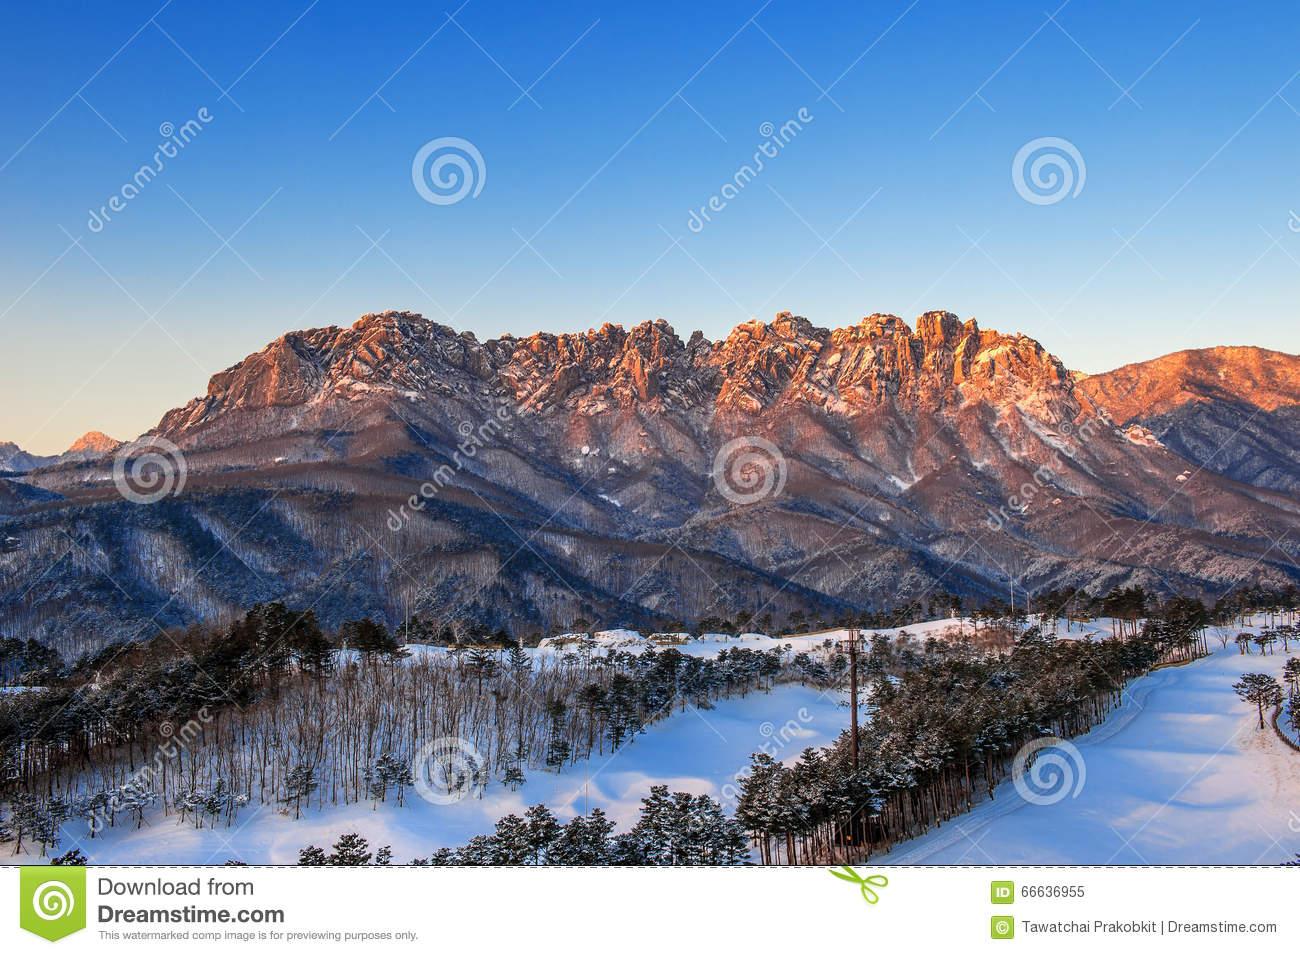 Ulsan Bawi Rock In Seoraksan Mountains In Winter,Korea. Stock.